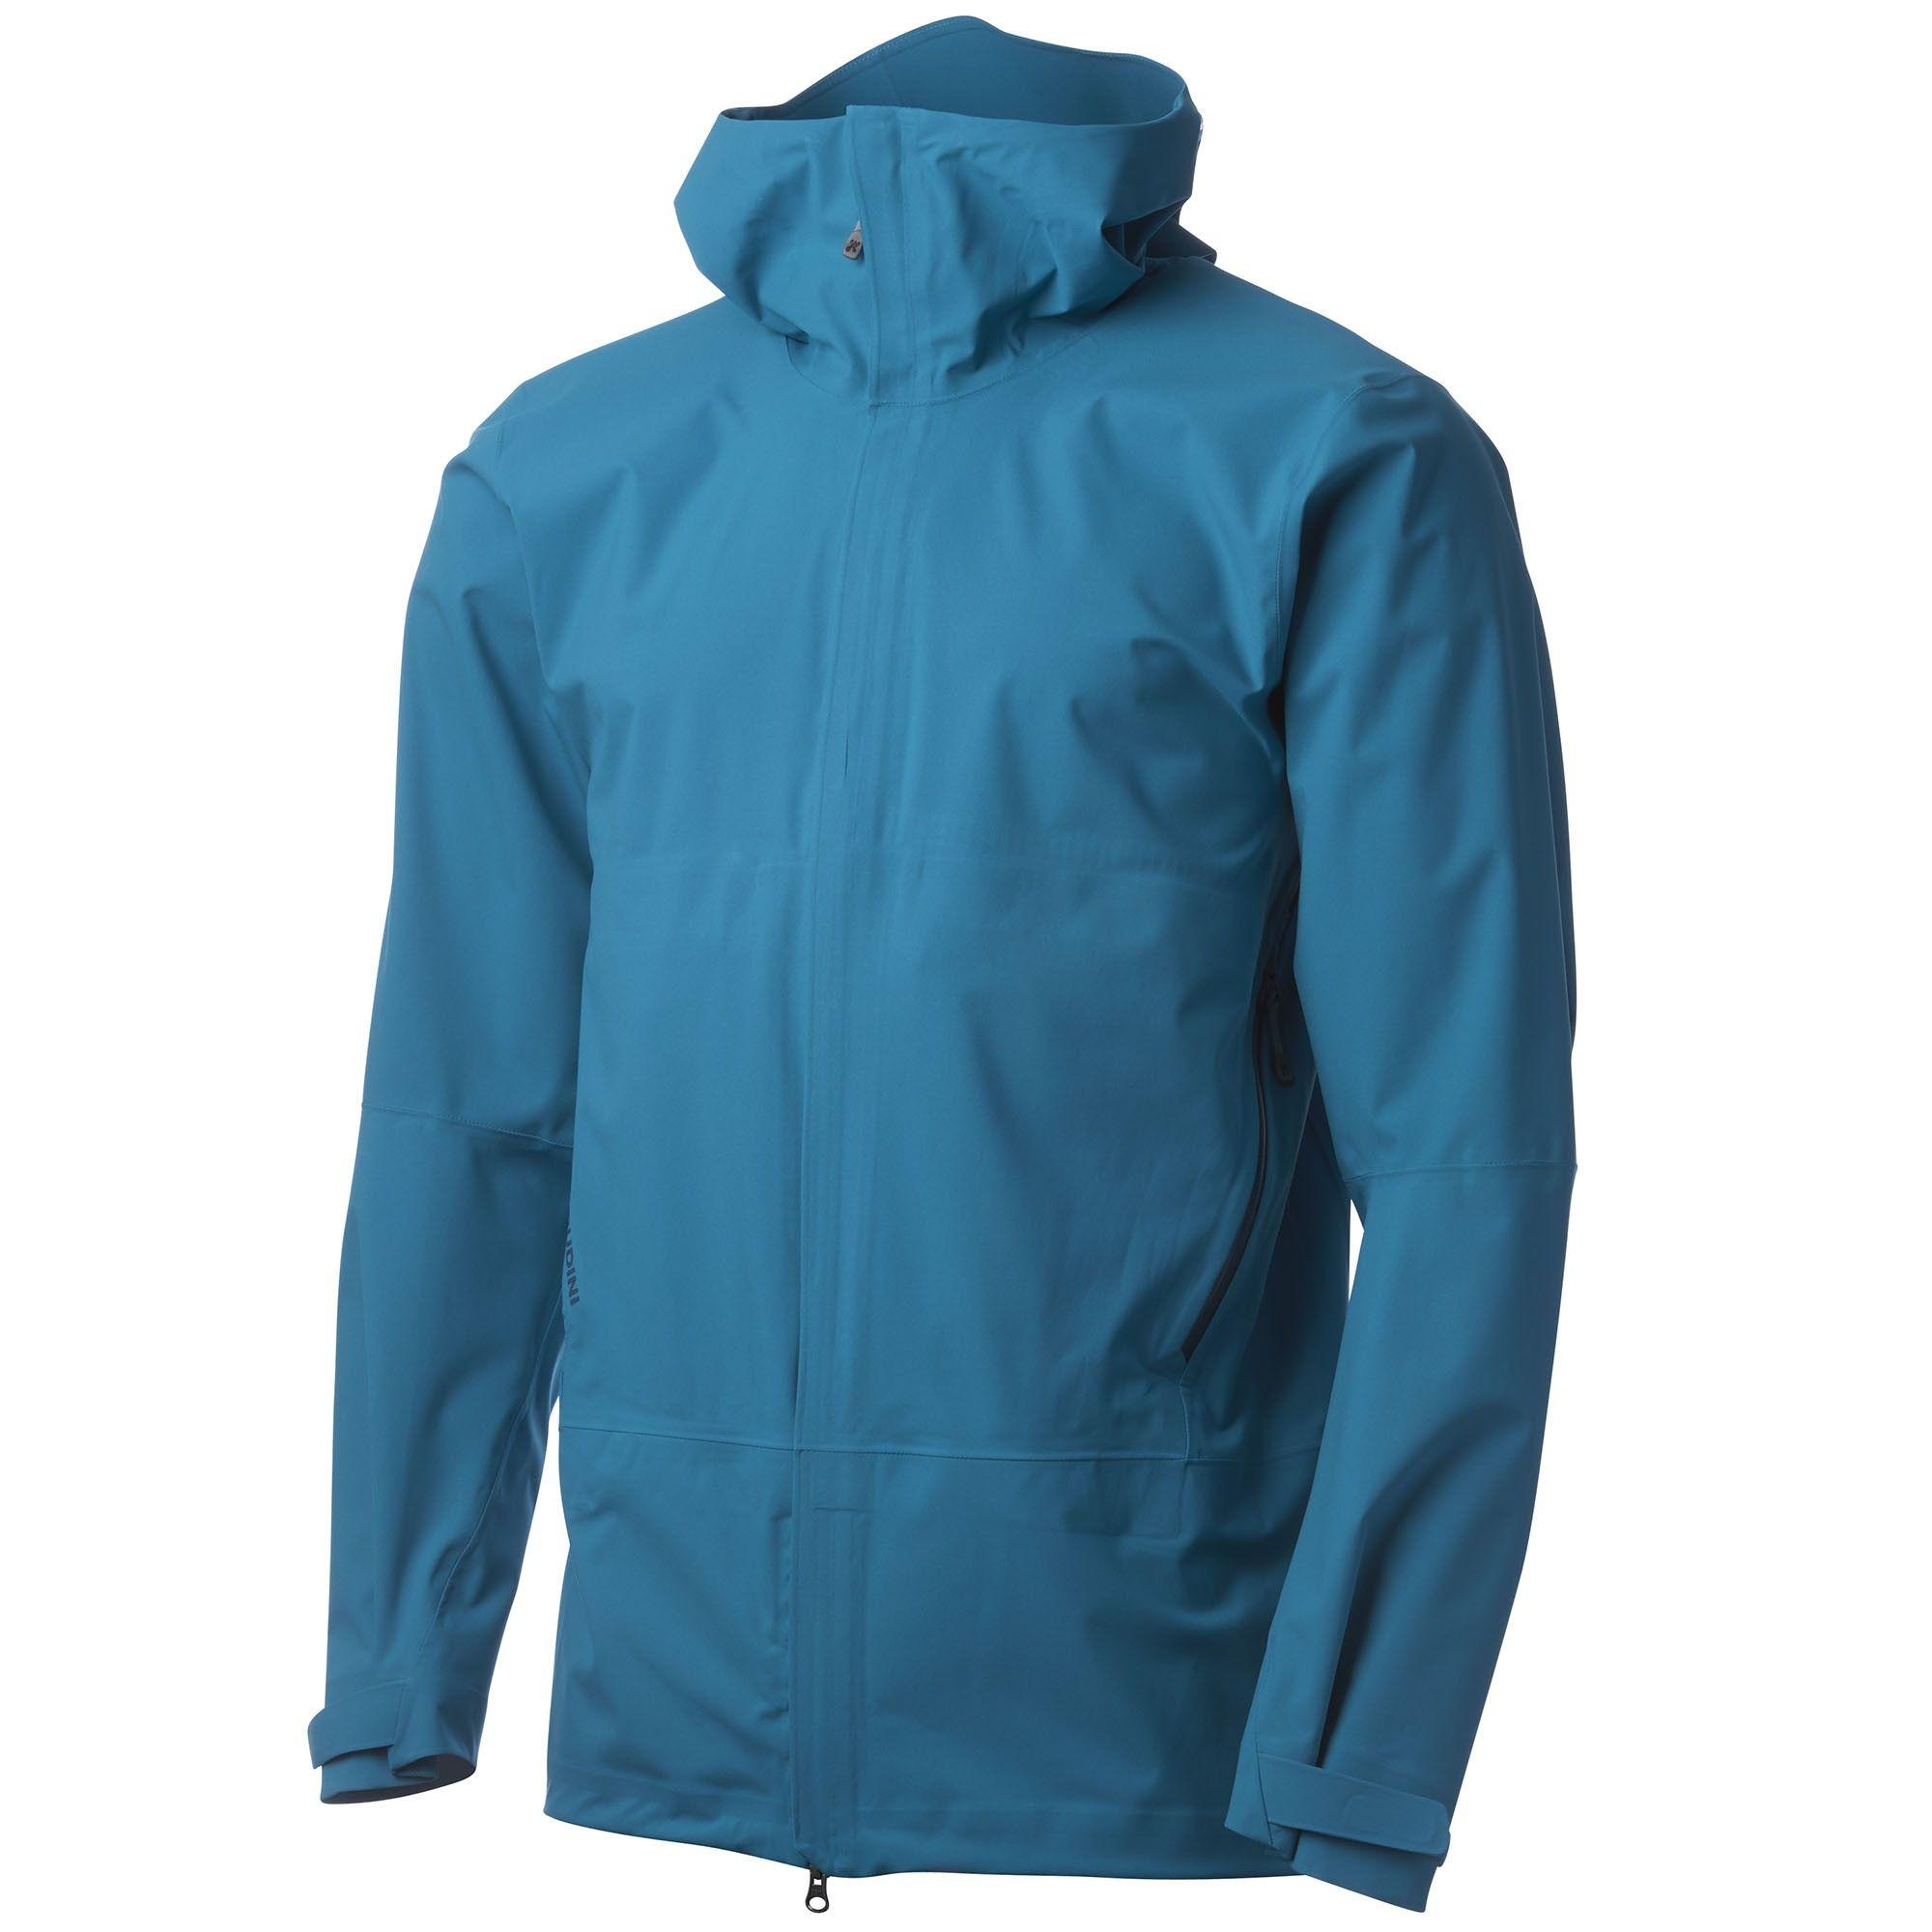 Houdini BFF Jacket Blau, Male Freizeitjacke, S